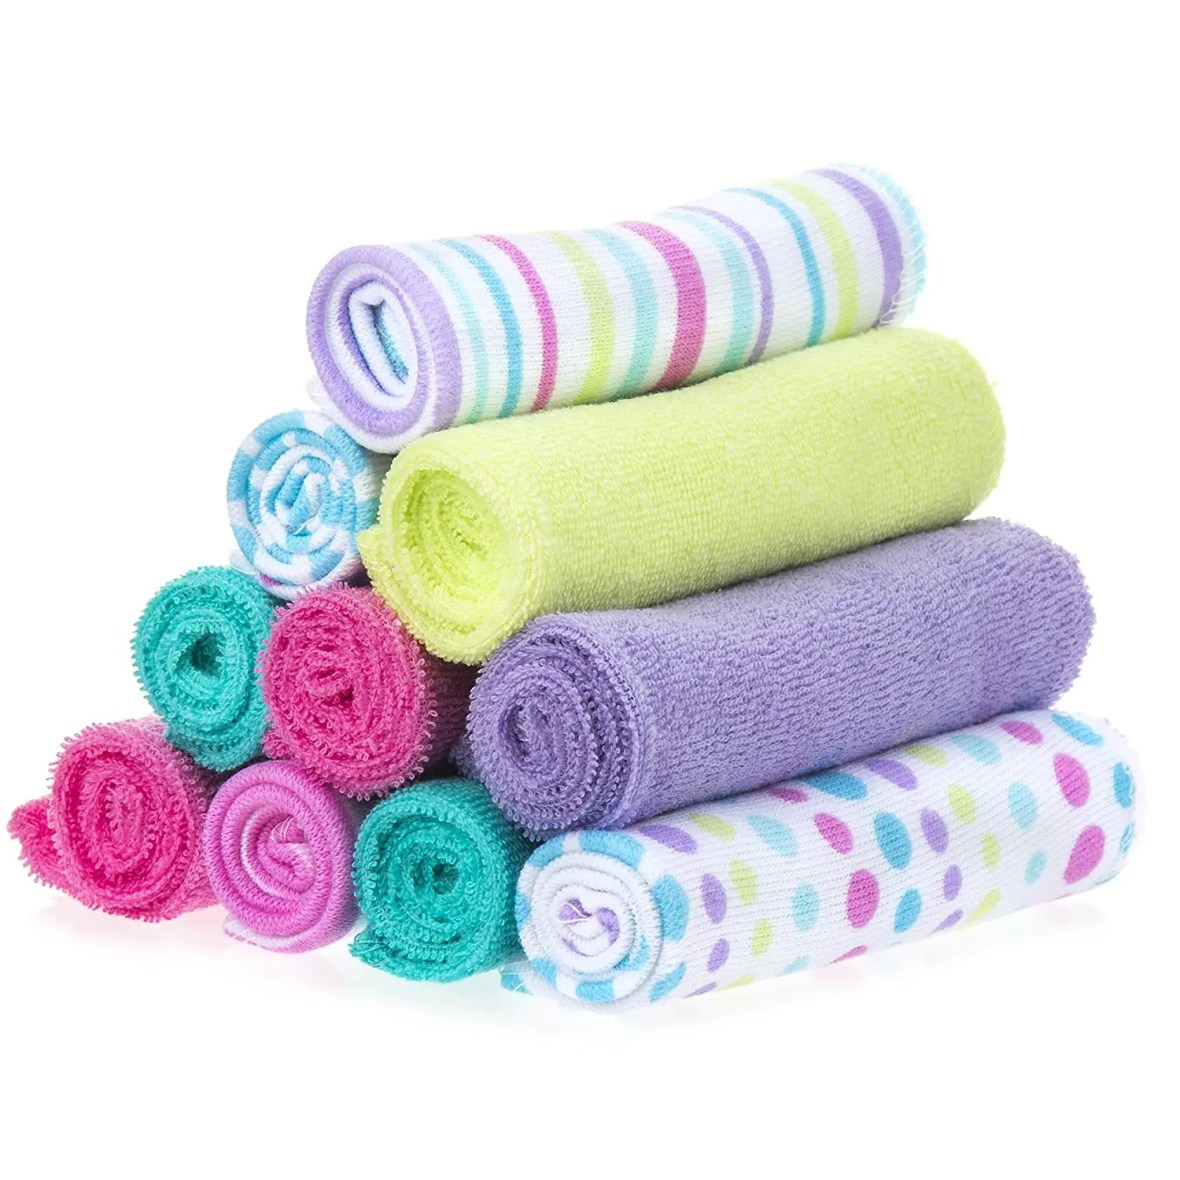 Spasilk 10 Pack Soft Terry Bath Washcloths Girlish